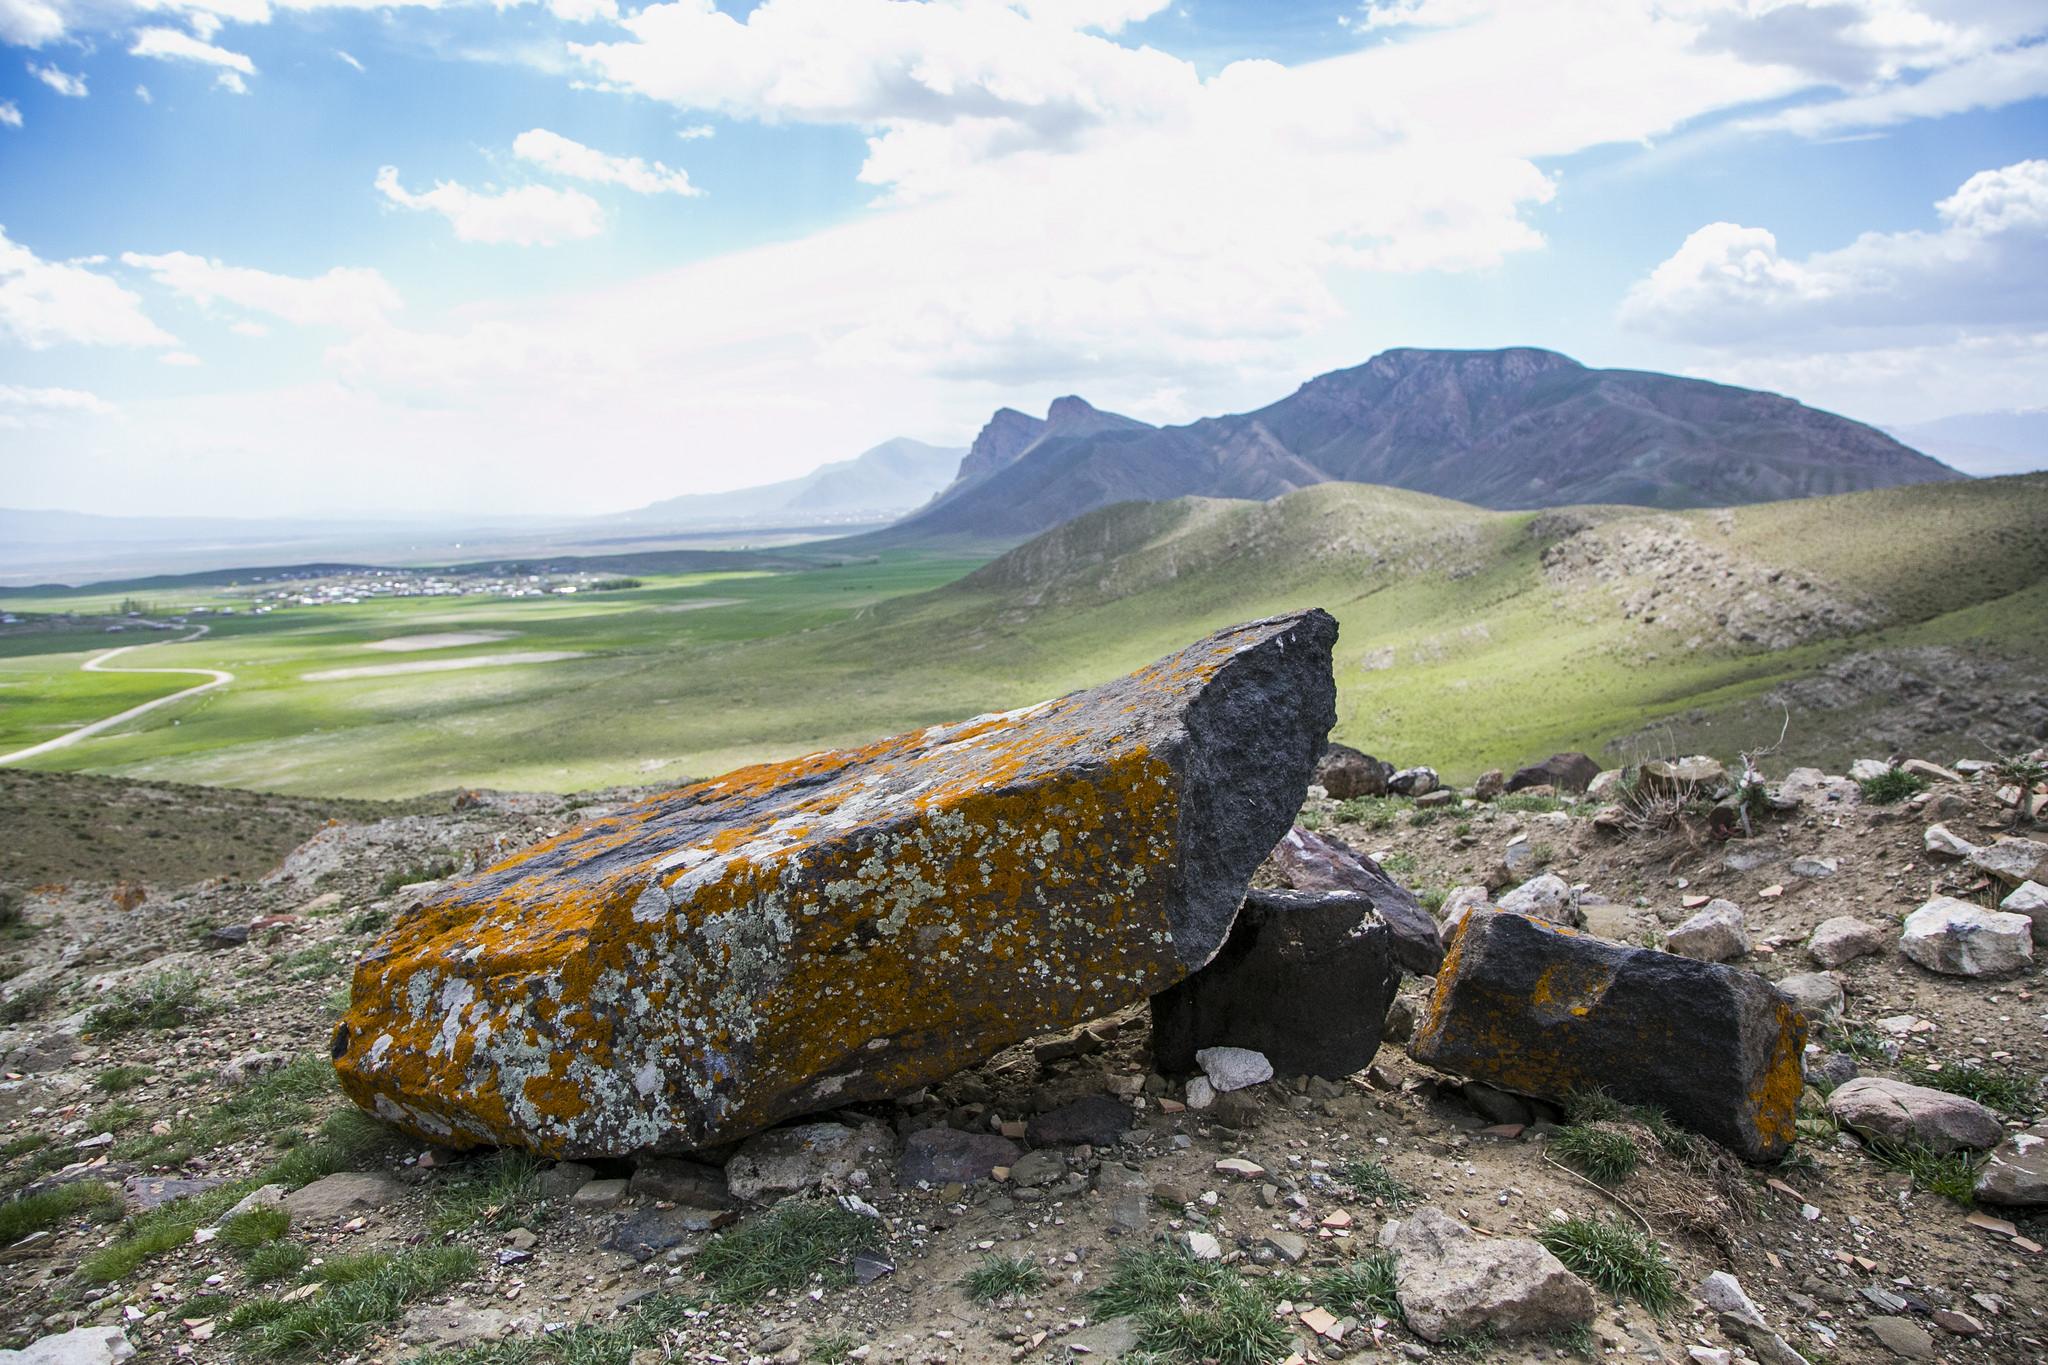 Drogue anchor stone. Sağlıksuyu Arzap Kazan, east Turkey.